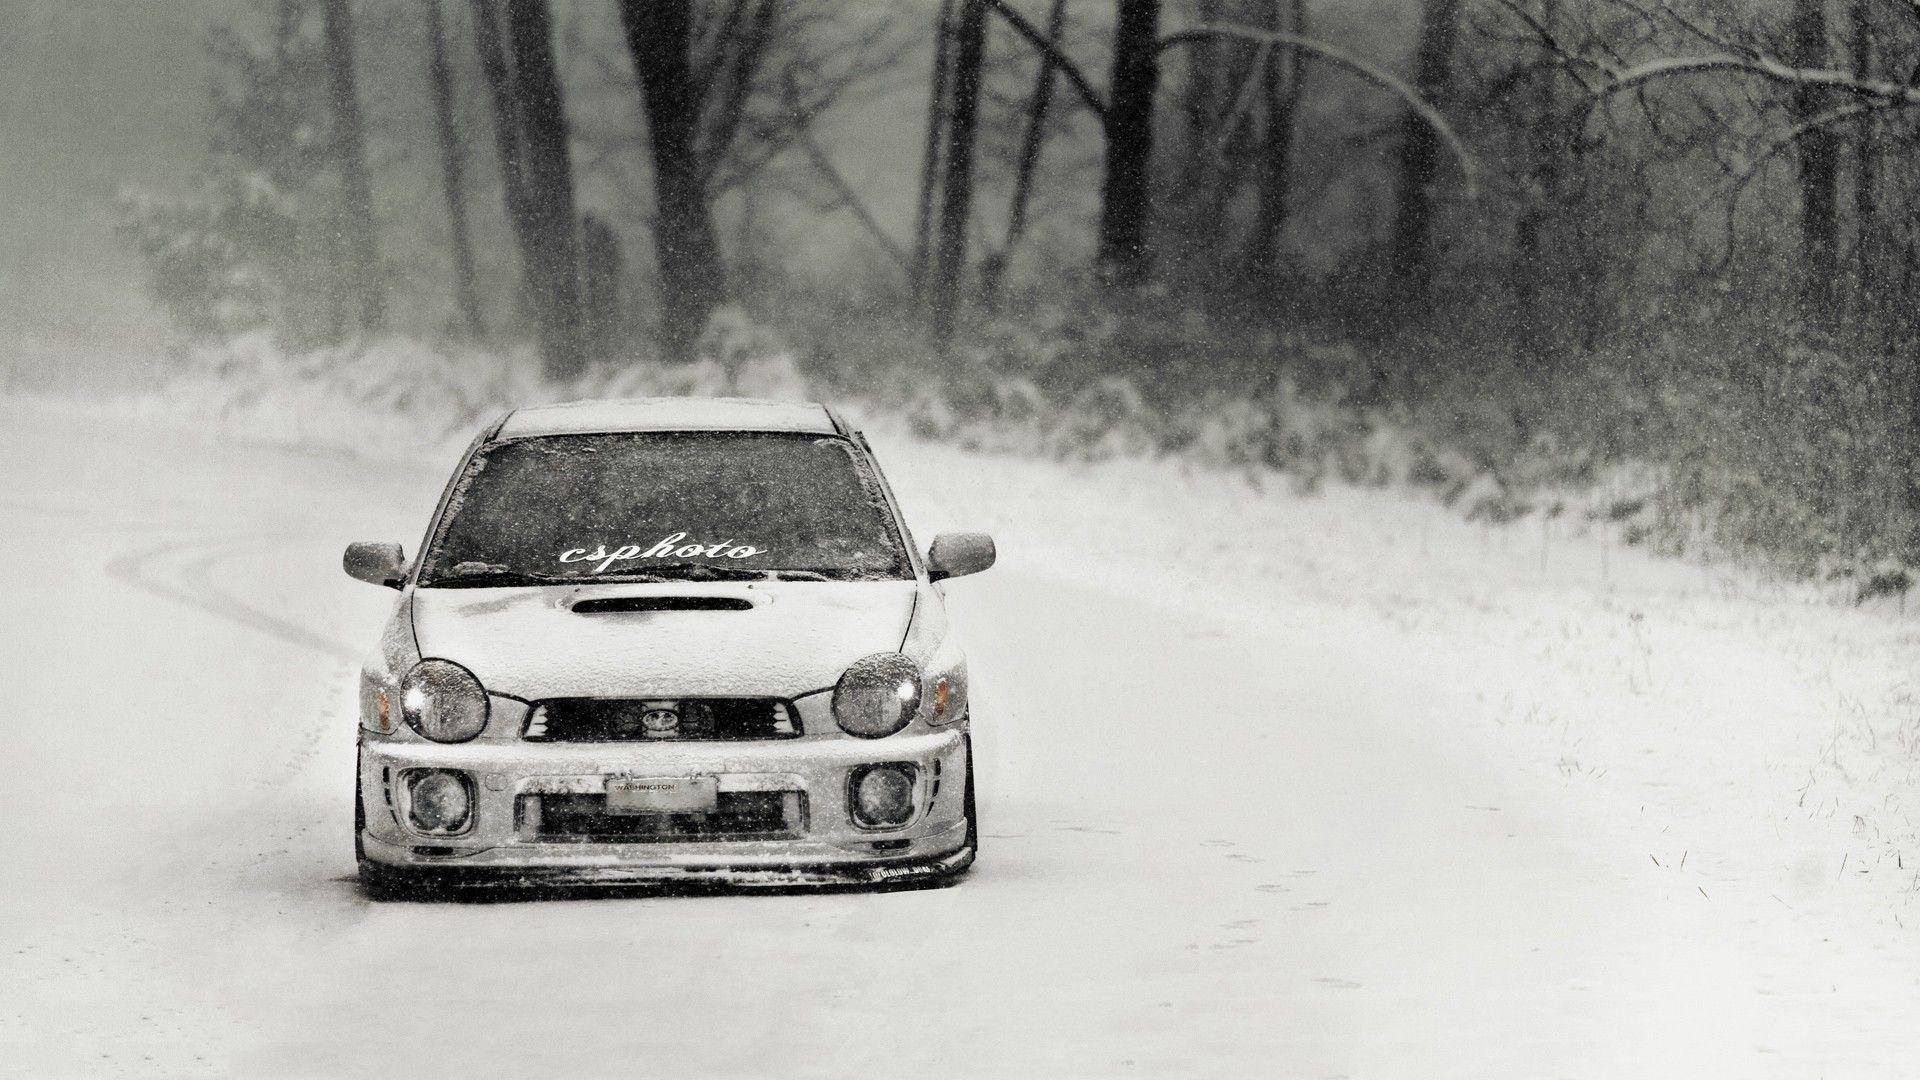 Subaru wrx jdm sti cars hd wallpaper - View Download Comment And Rate This 1920x1080 Subaru Impreza Wallpaper Wallpaper Abyss